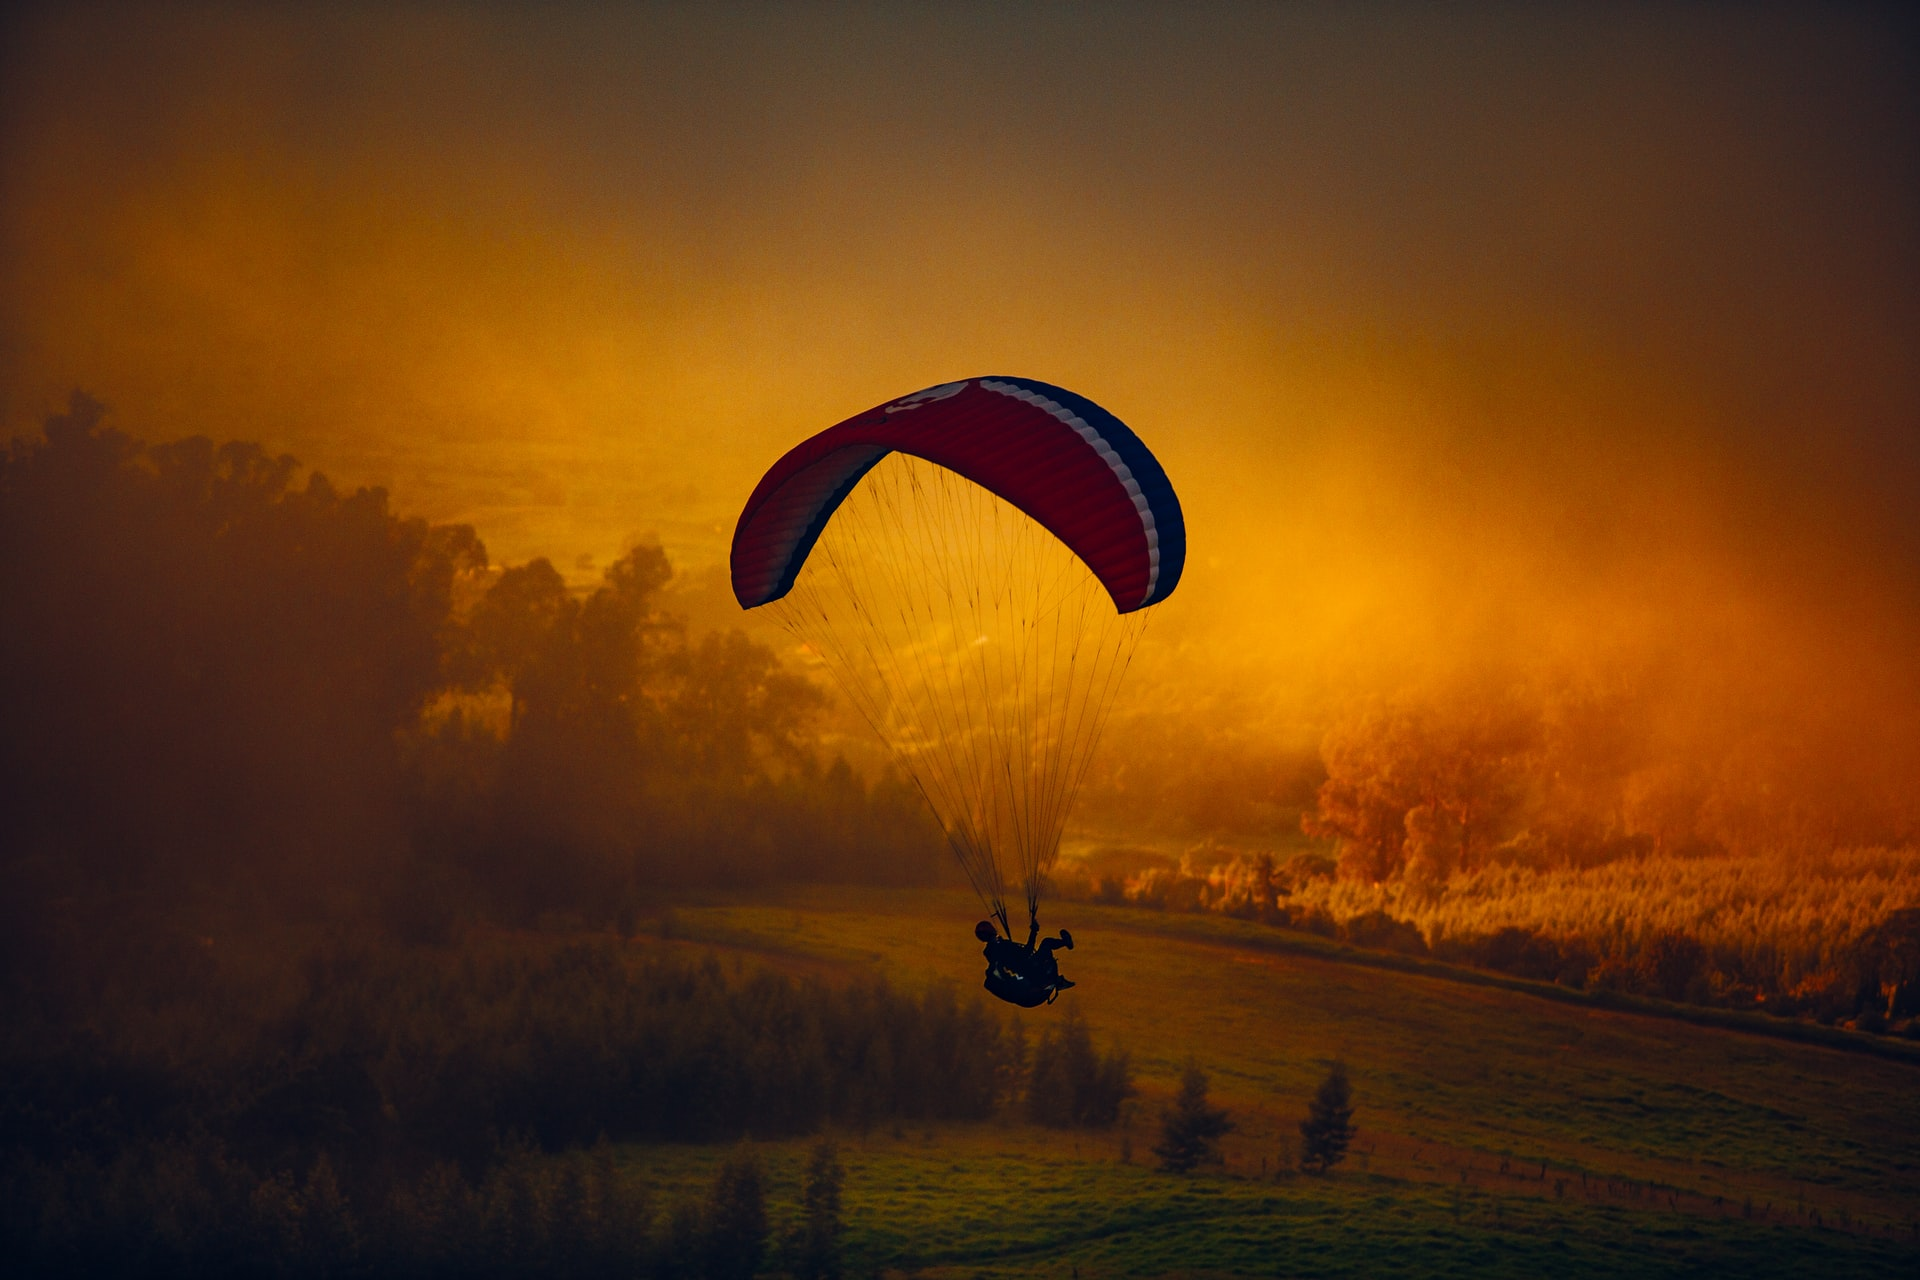 5 tips για να ξεκινήσεις το paragliding